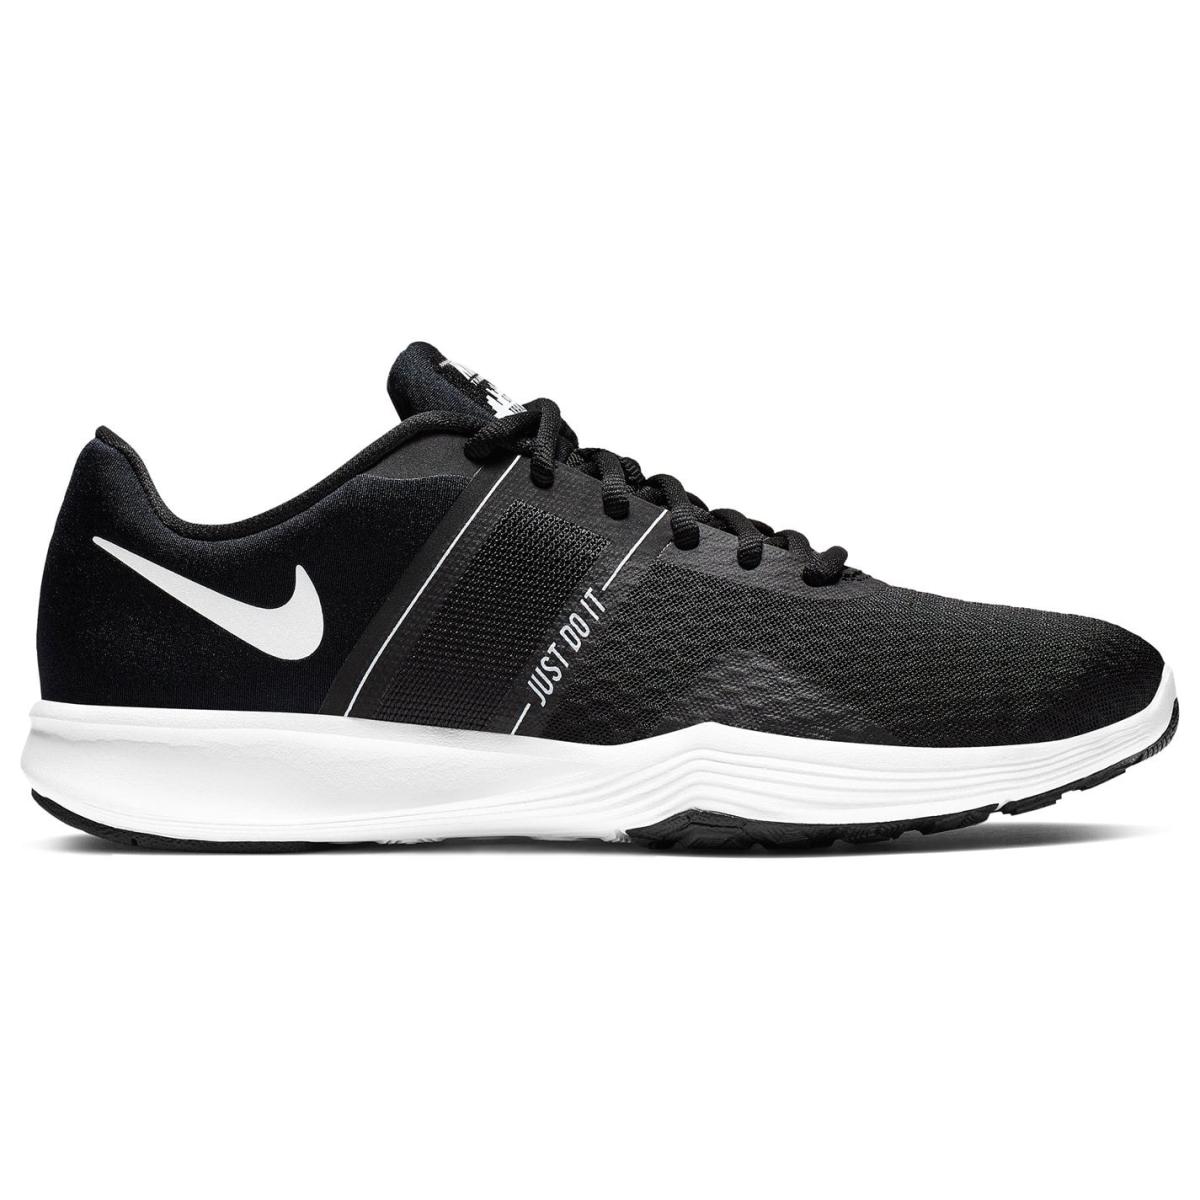 Nike-City-Trainer-2-Turnschuhe-Laufschuhe-Damen-Sportschuhe-Sneaker-3121 Indexbild 3